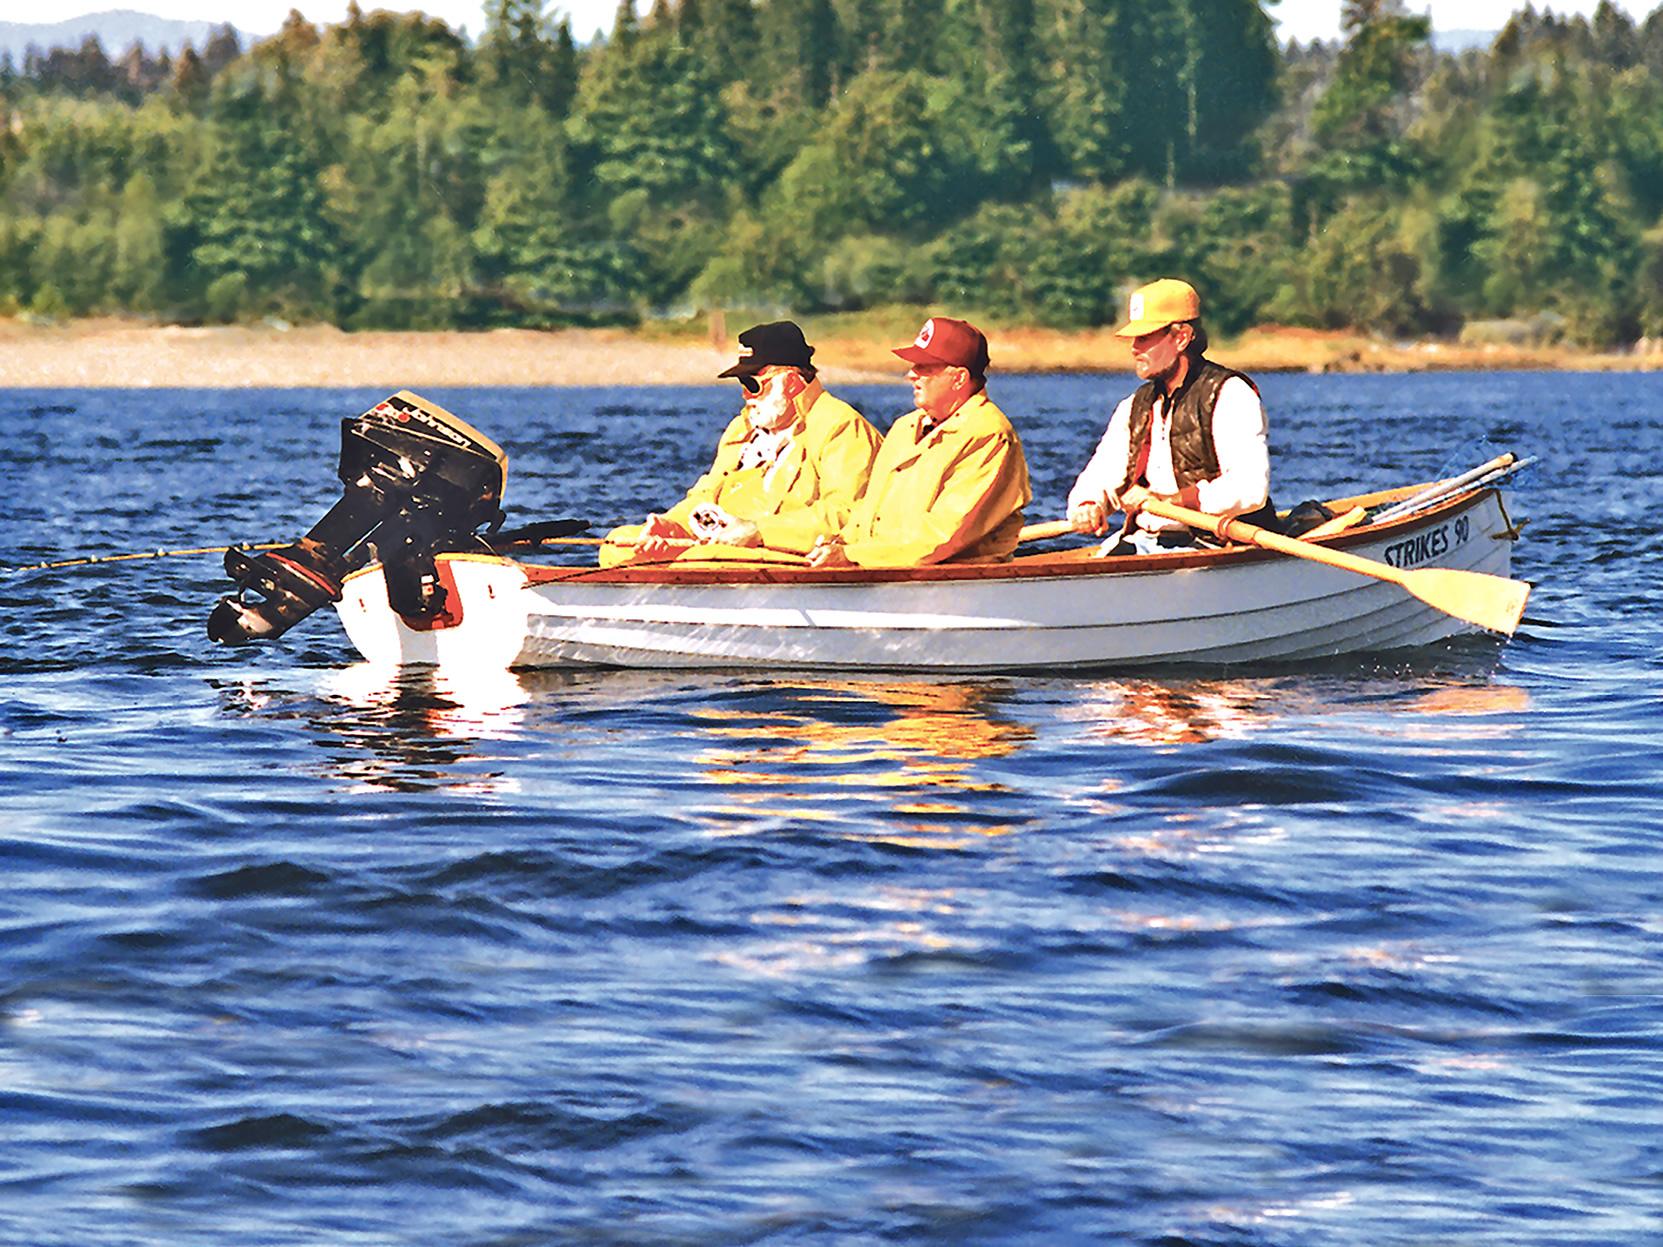 whitehall-tyee-spirit-14-fishing-rowing-boats-2-1663x1247